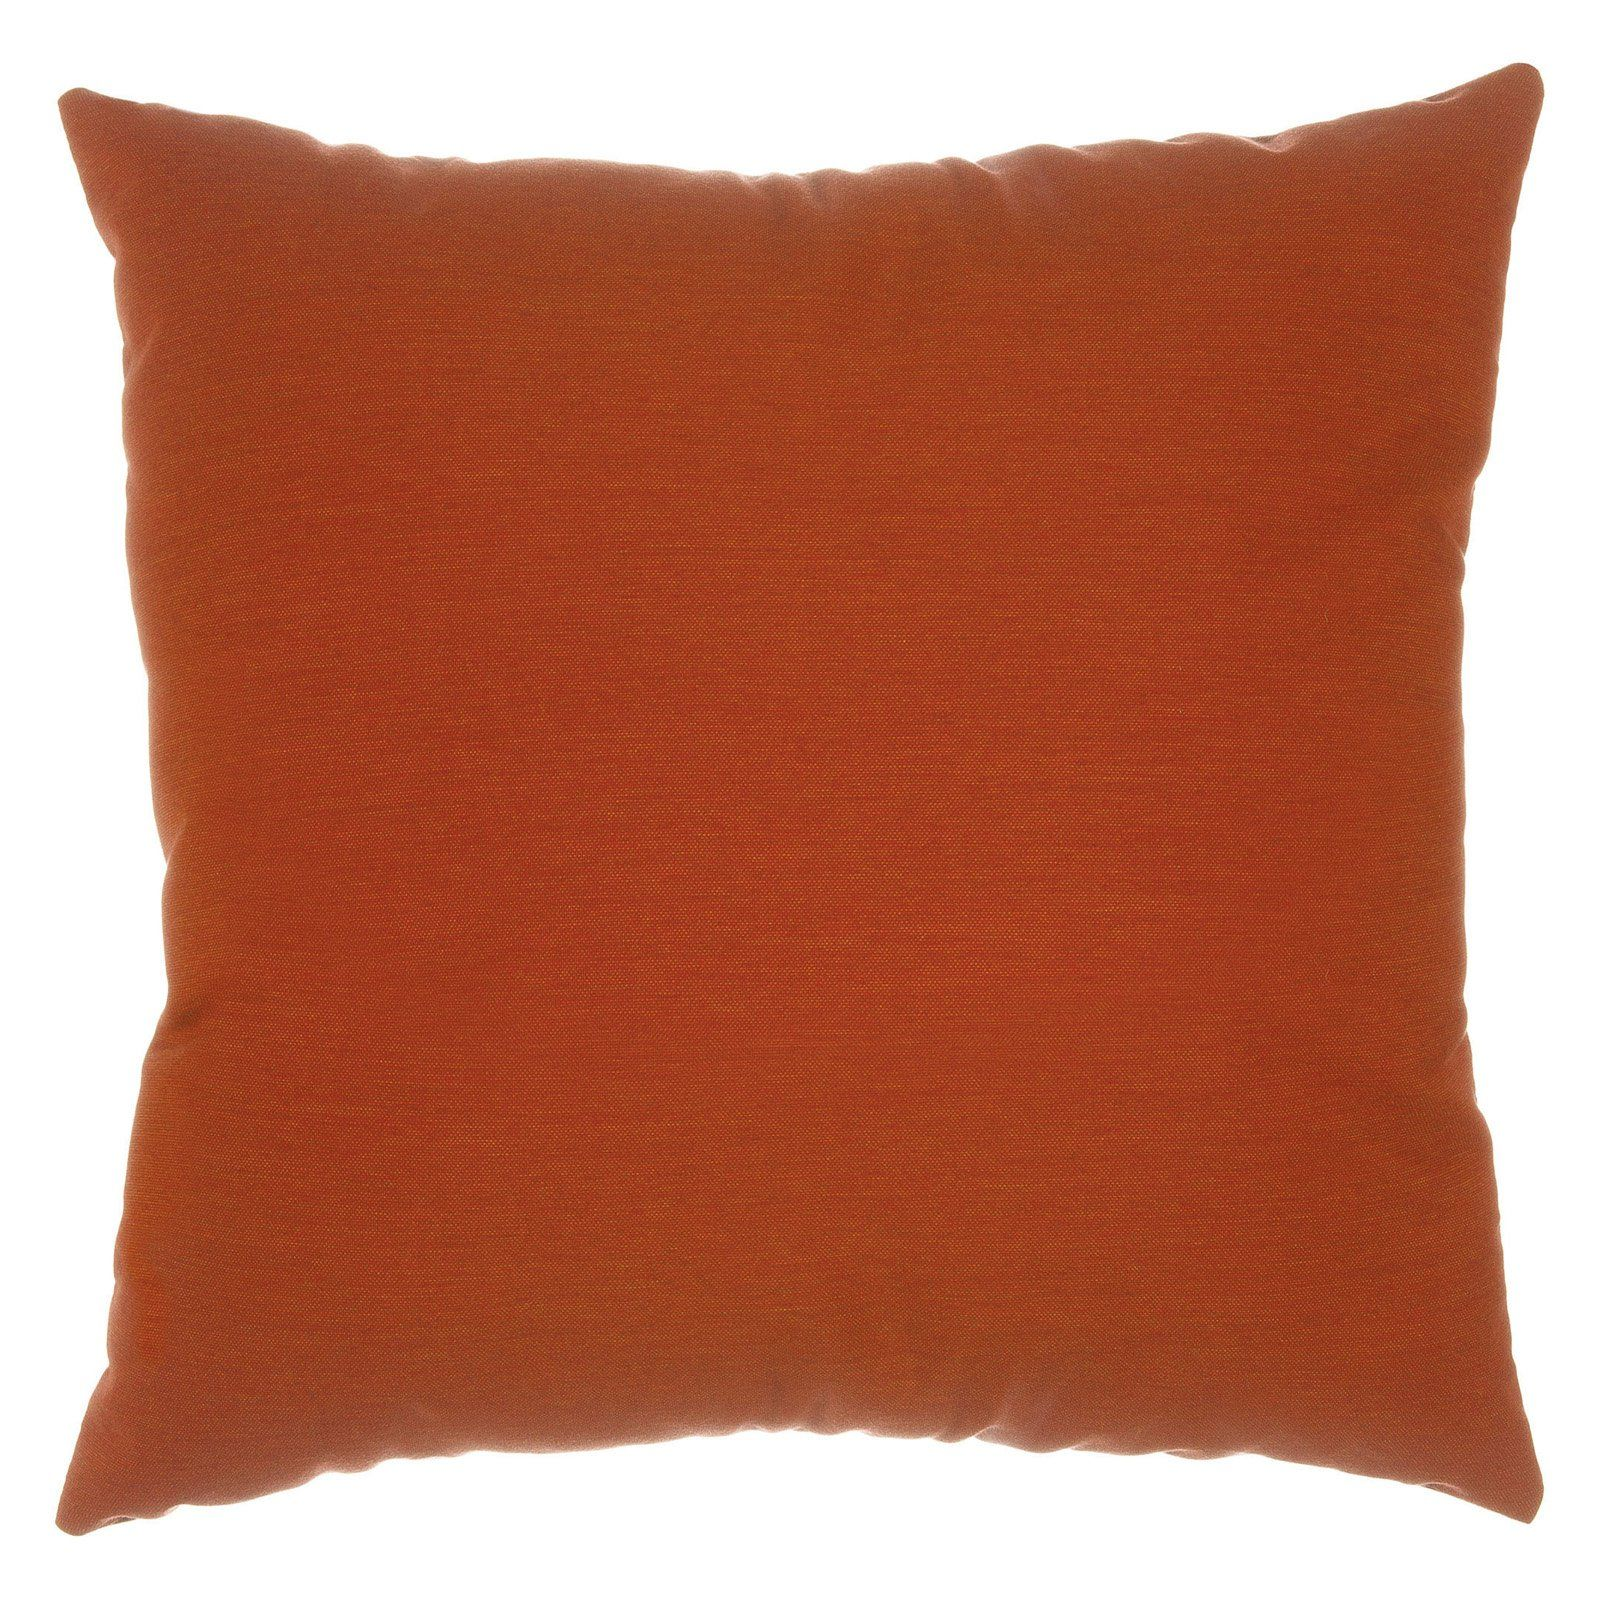 Pawleys Island Sunbrella Solid Outdoor Pillow Brick ...